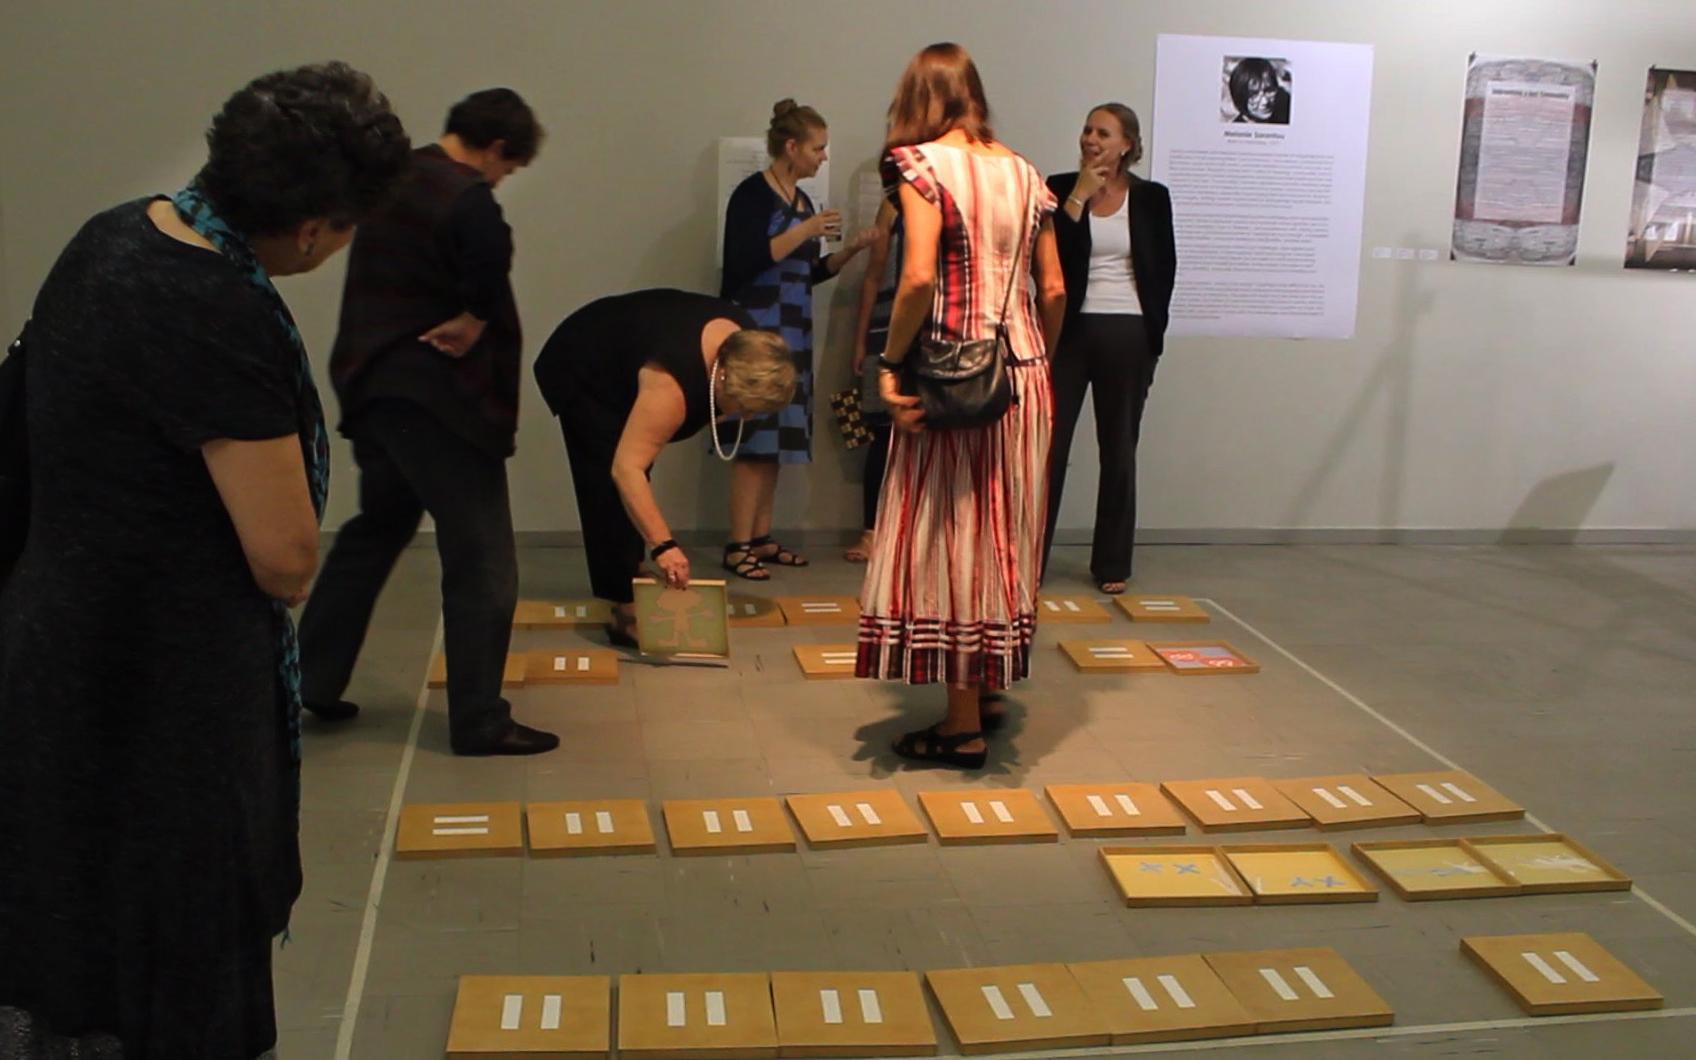 Playing_Human Rights Video Still: Kirsten Wechslberger